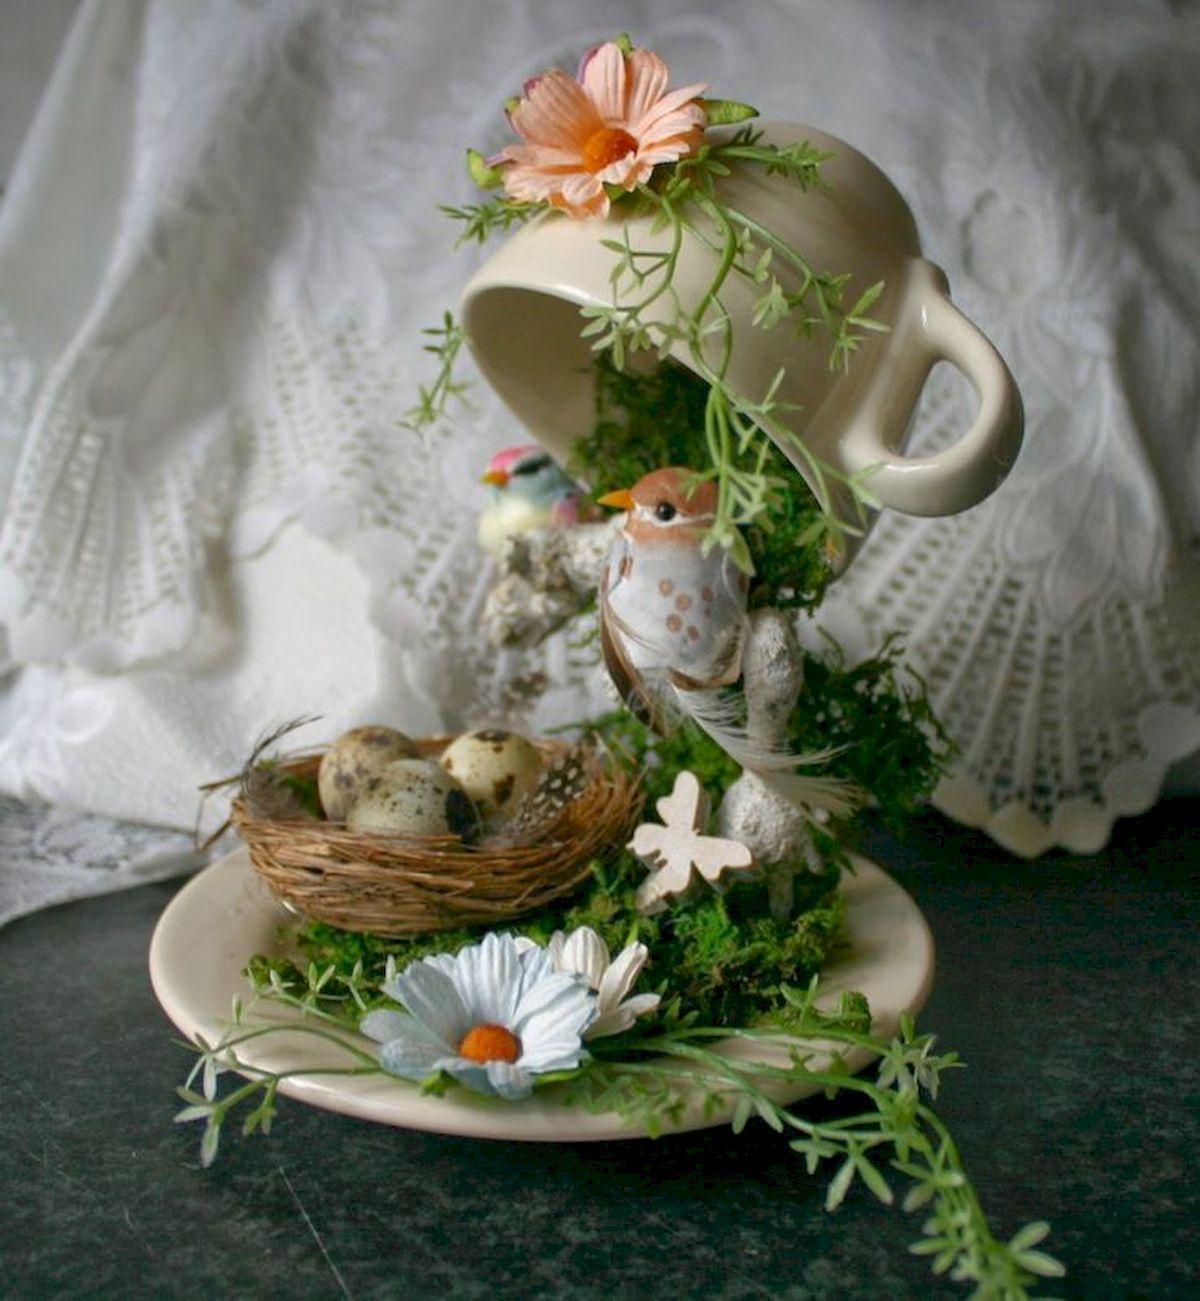 50 Easy Diy Summer Gardening Teacup Fairy Garden Ideas 20 400 x 300